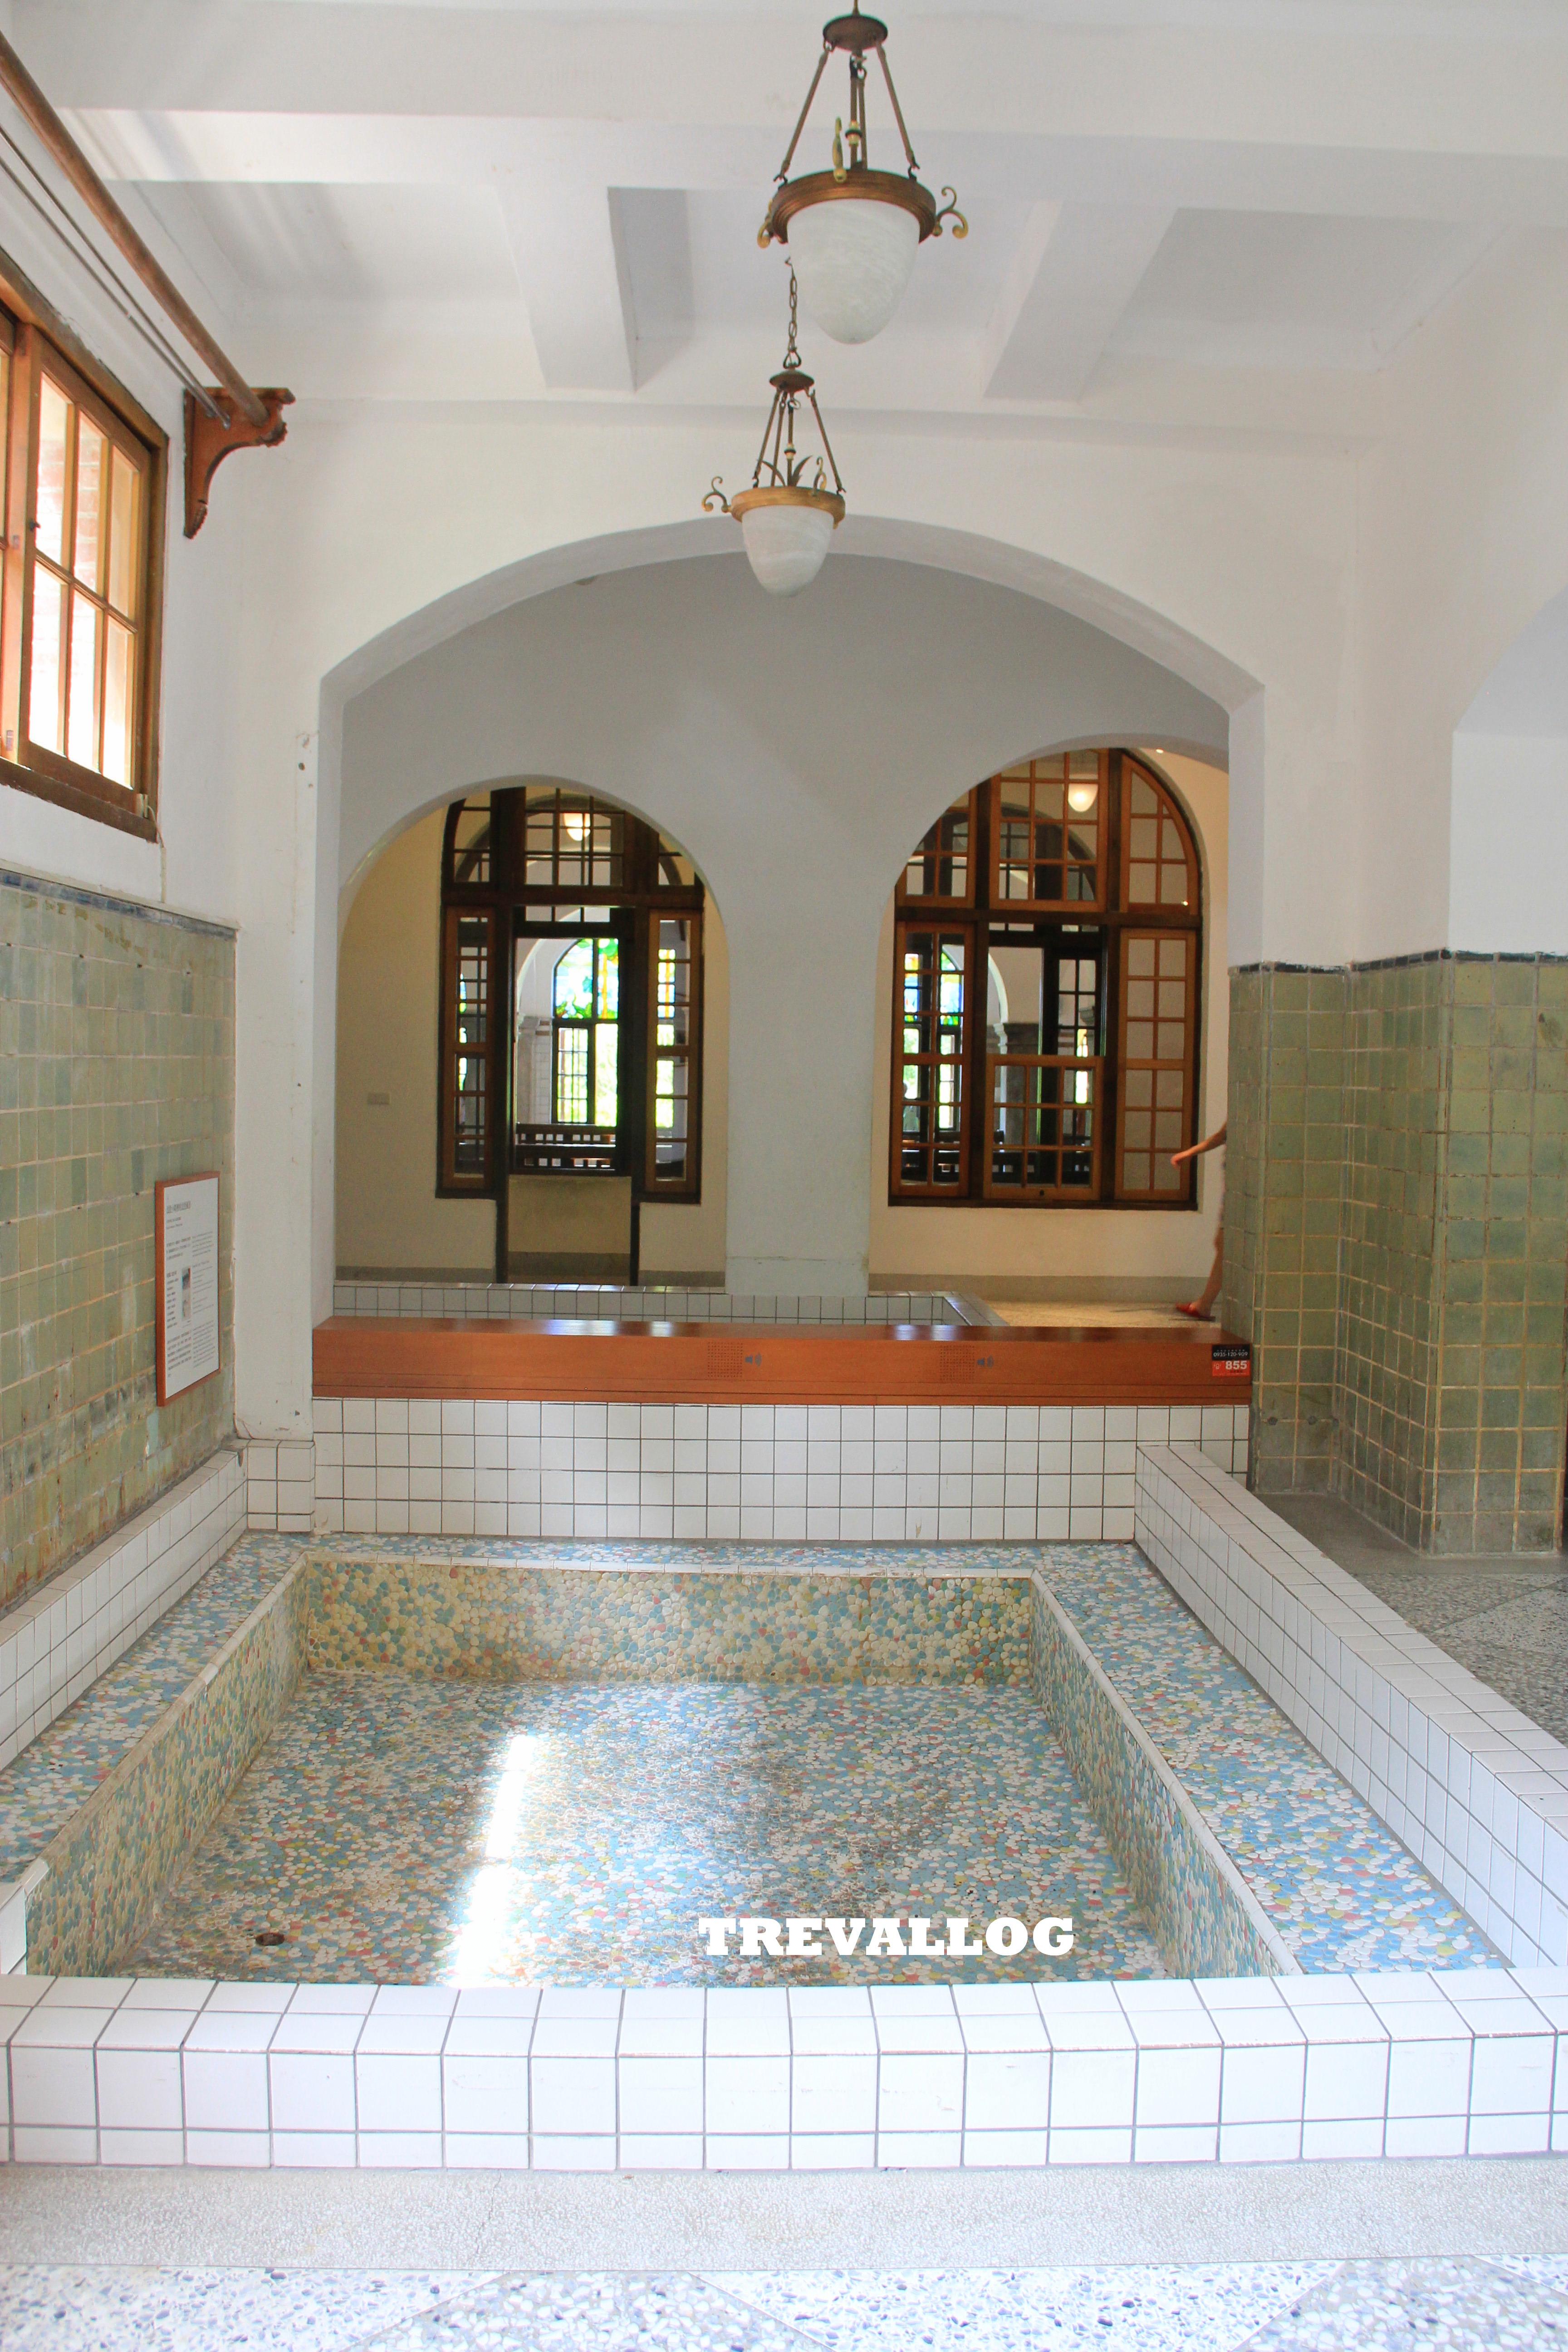 Beitou Hot Spring Museum public bath, Taipei, Taiwan